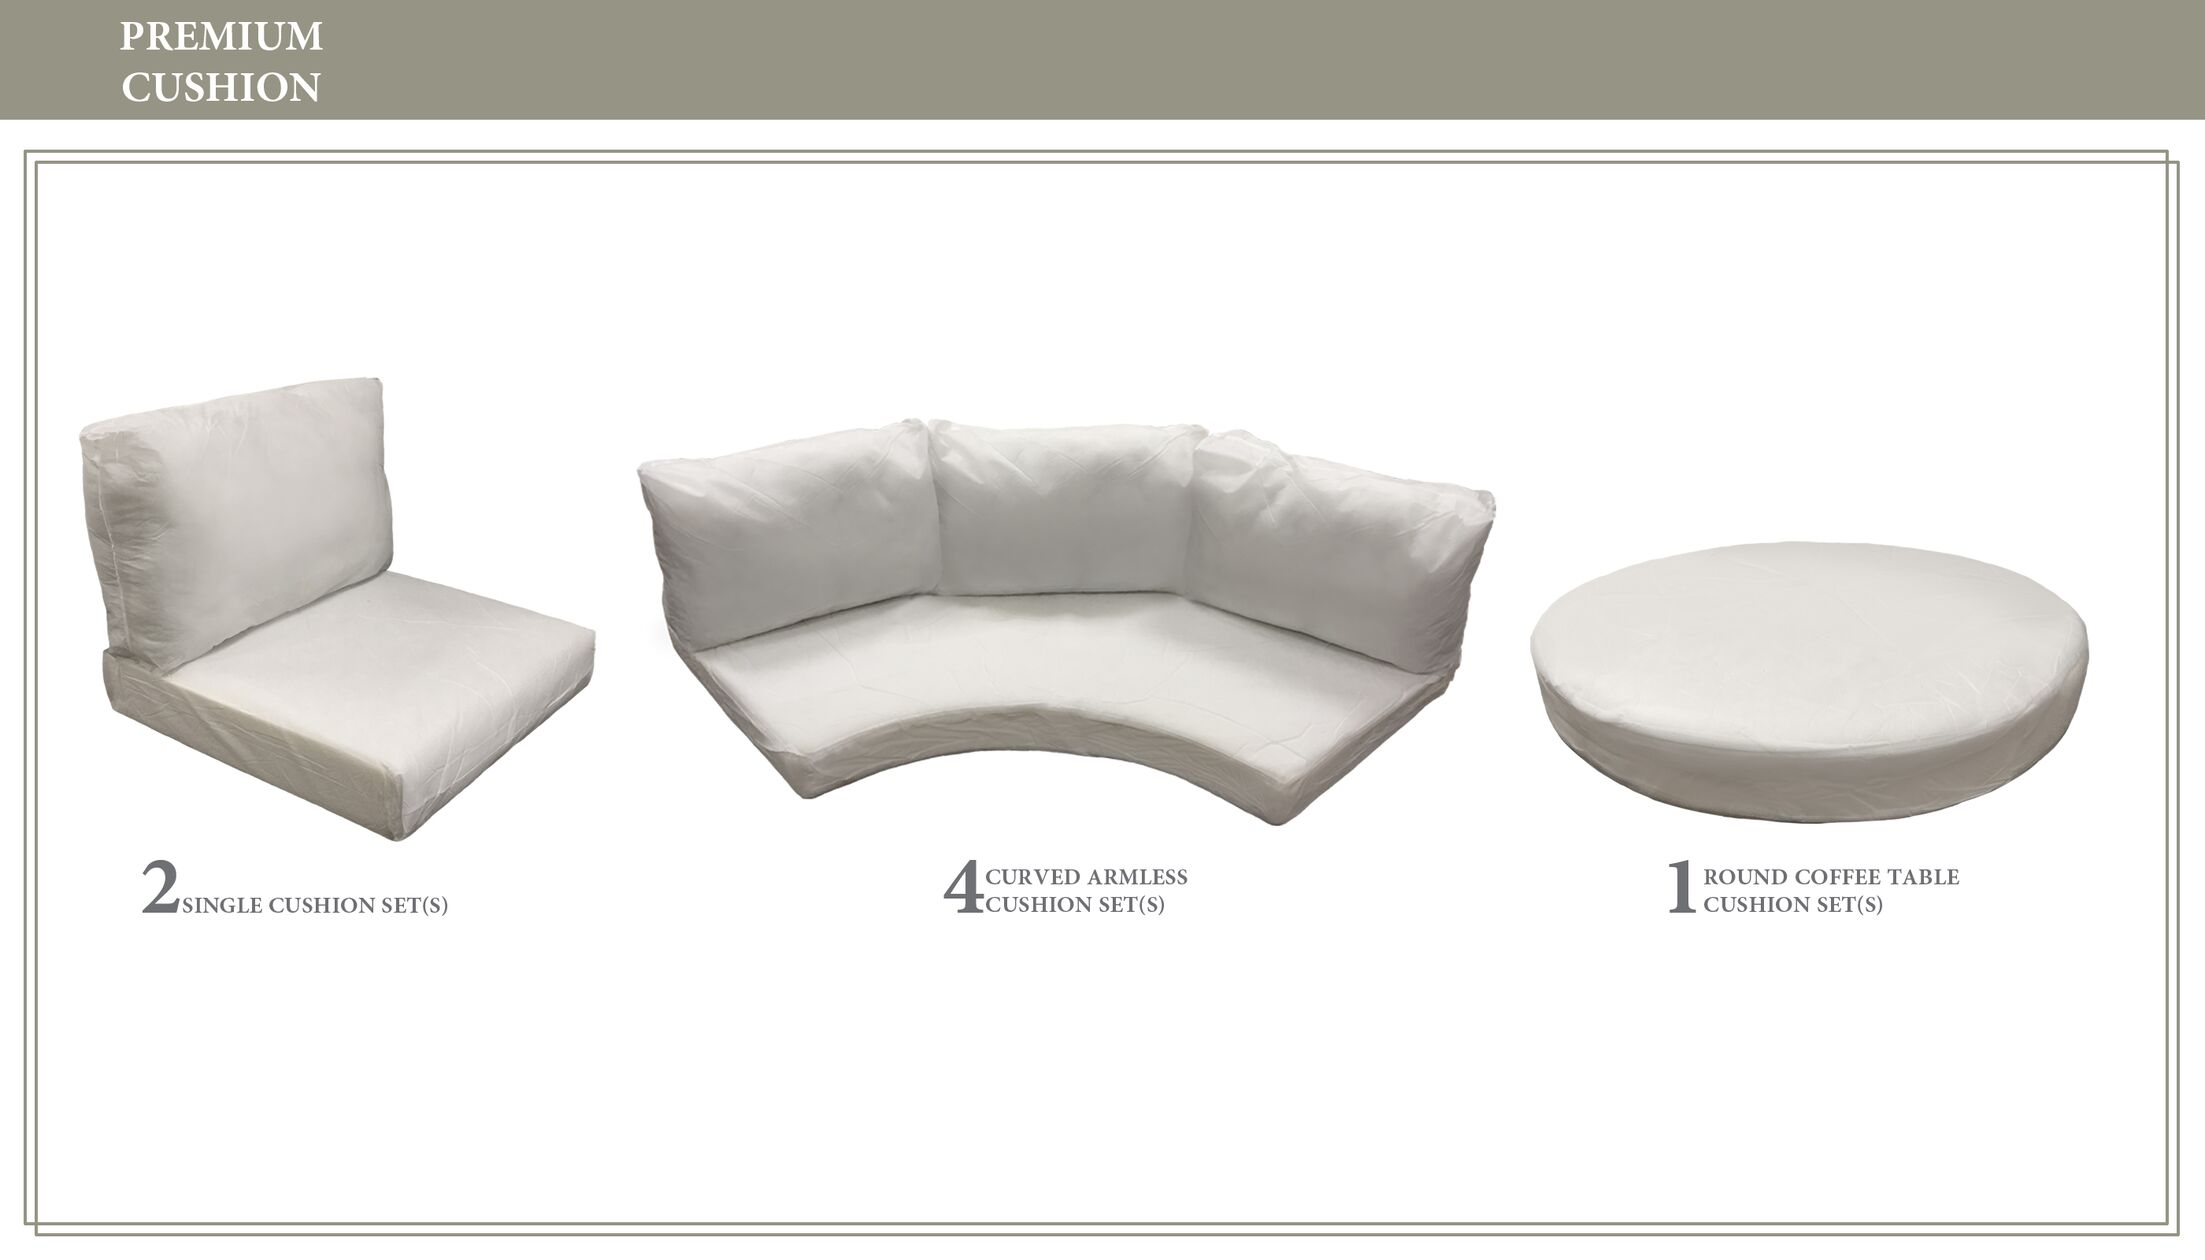 East Village 21 Piece Outdoor Cushion Set